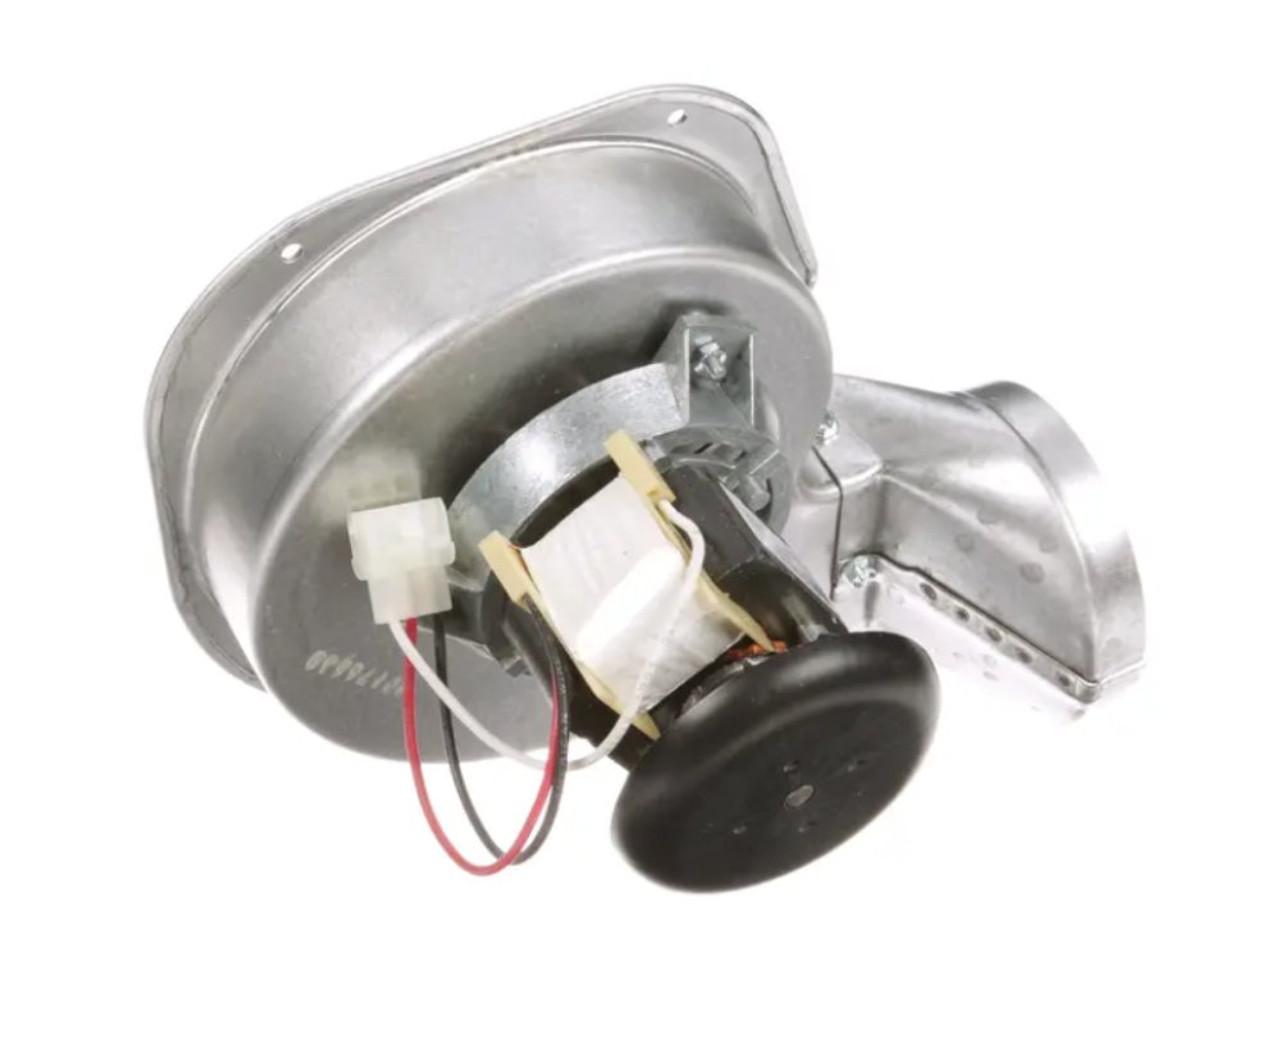 Trane Furnace Draft Inducer Blower 115v 7002 3445 D342078p04 Fasco A266